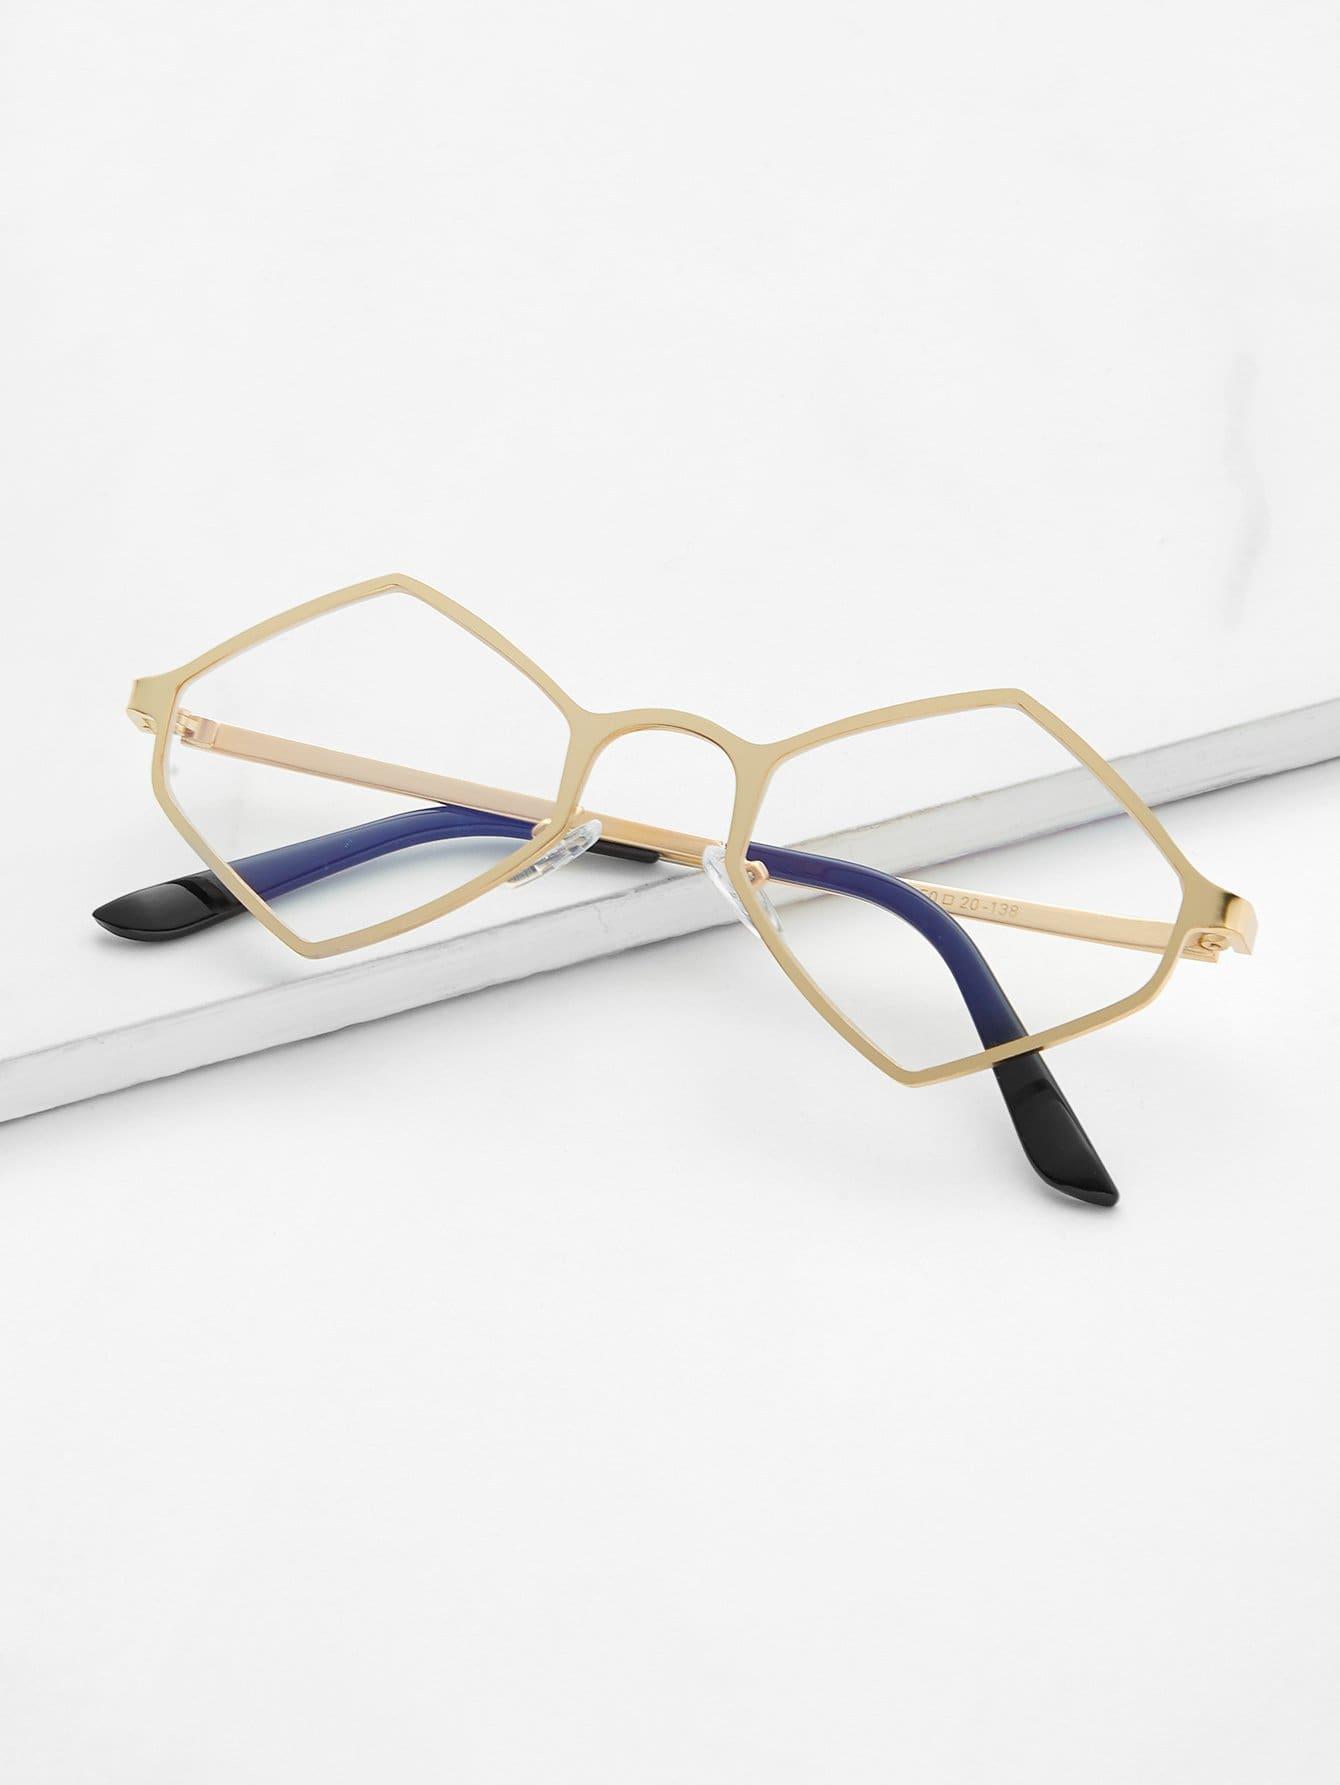 Metal Frame Glasses sunglass180409304